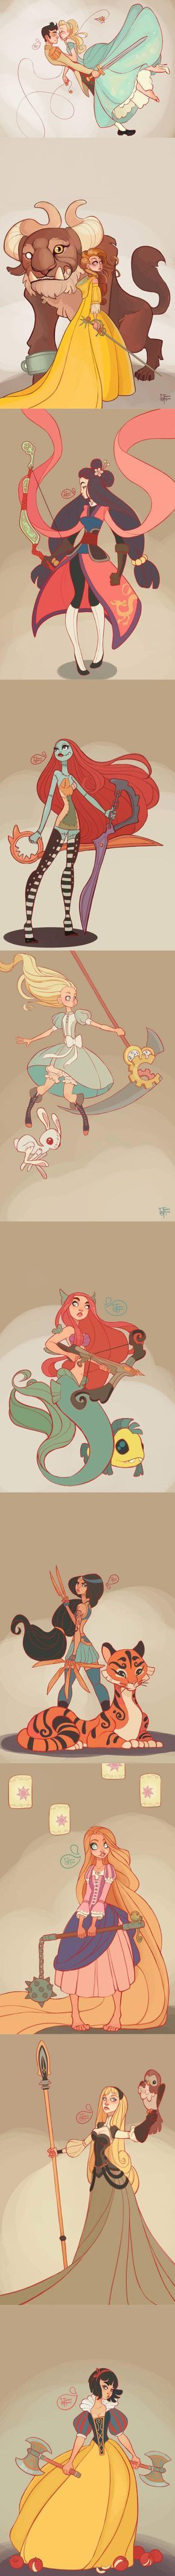 Amazing Disney Art By: MeoMai (Source: meomai.deviantart.com)